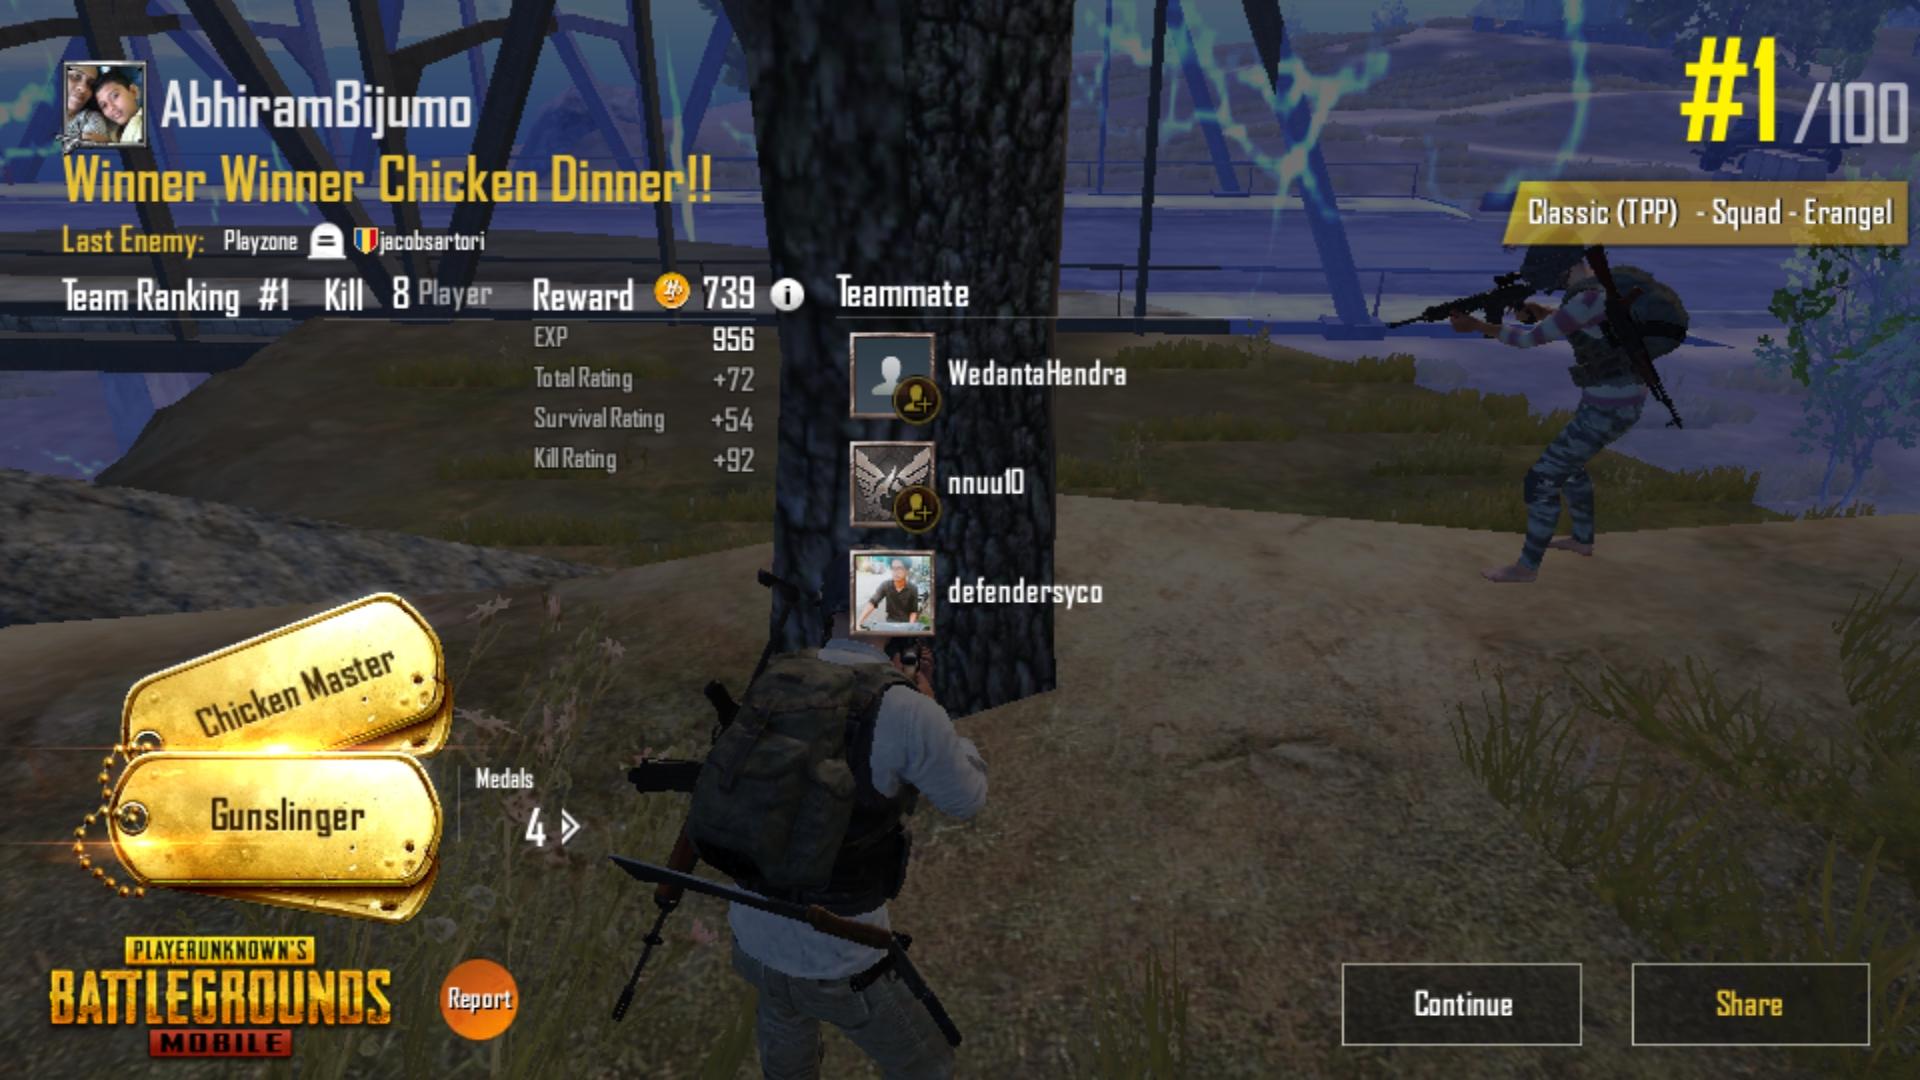 #Winner Winner Chicken dinner